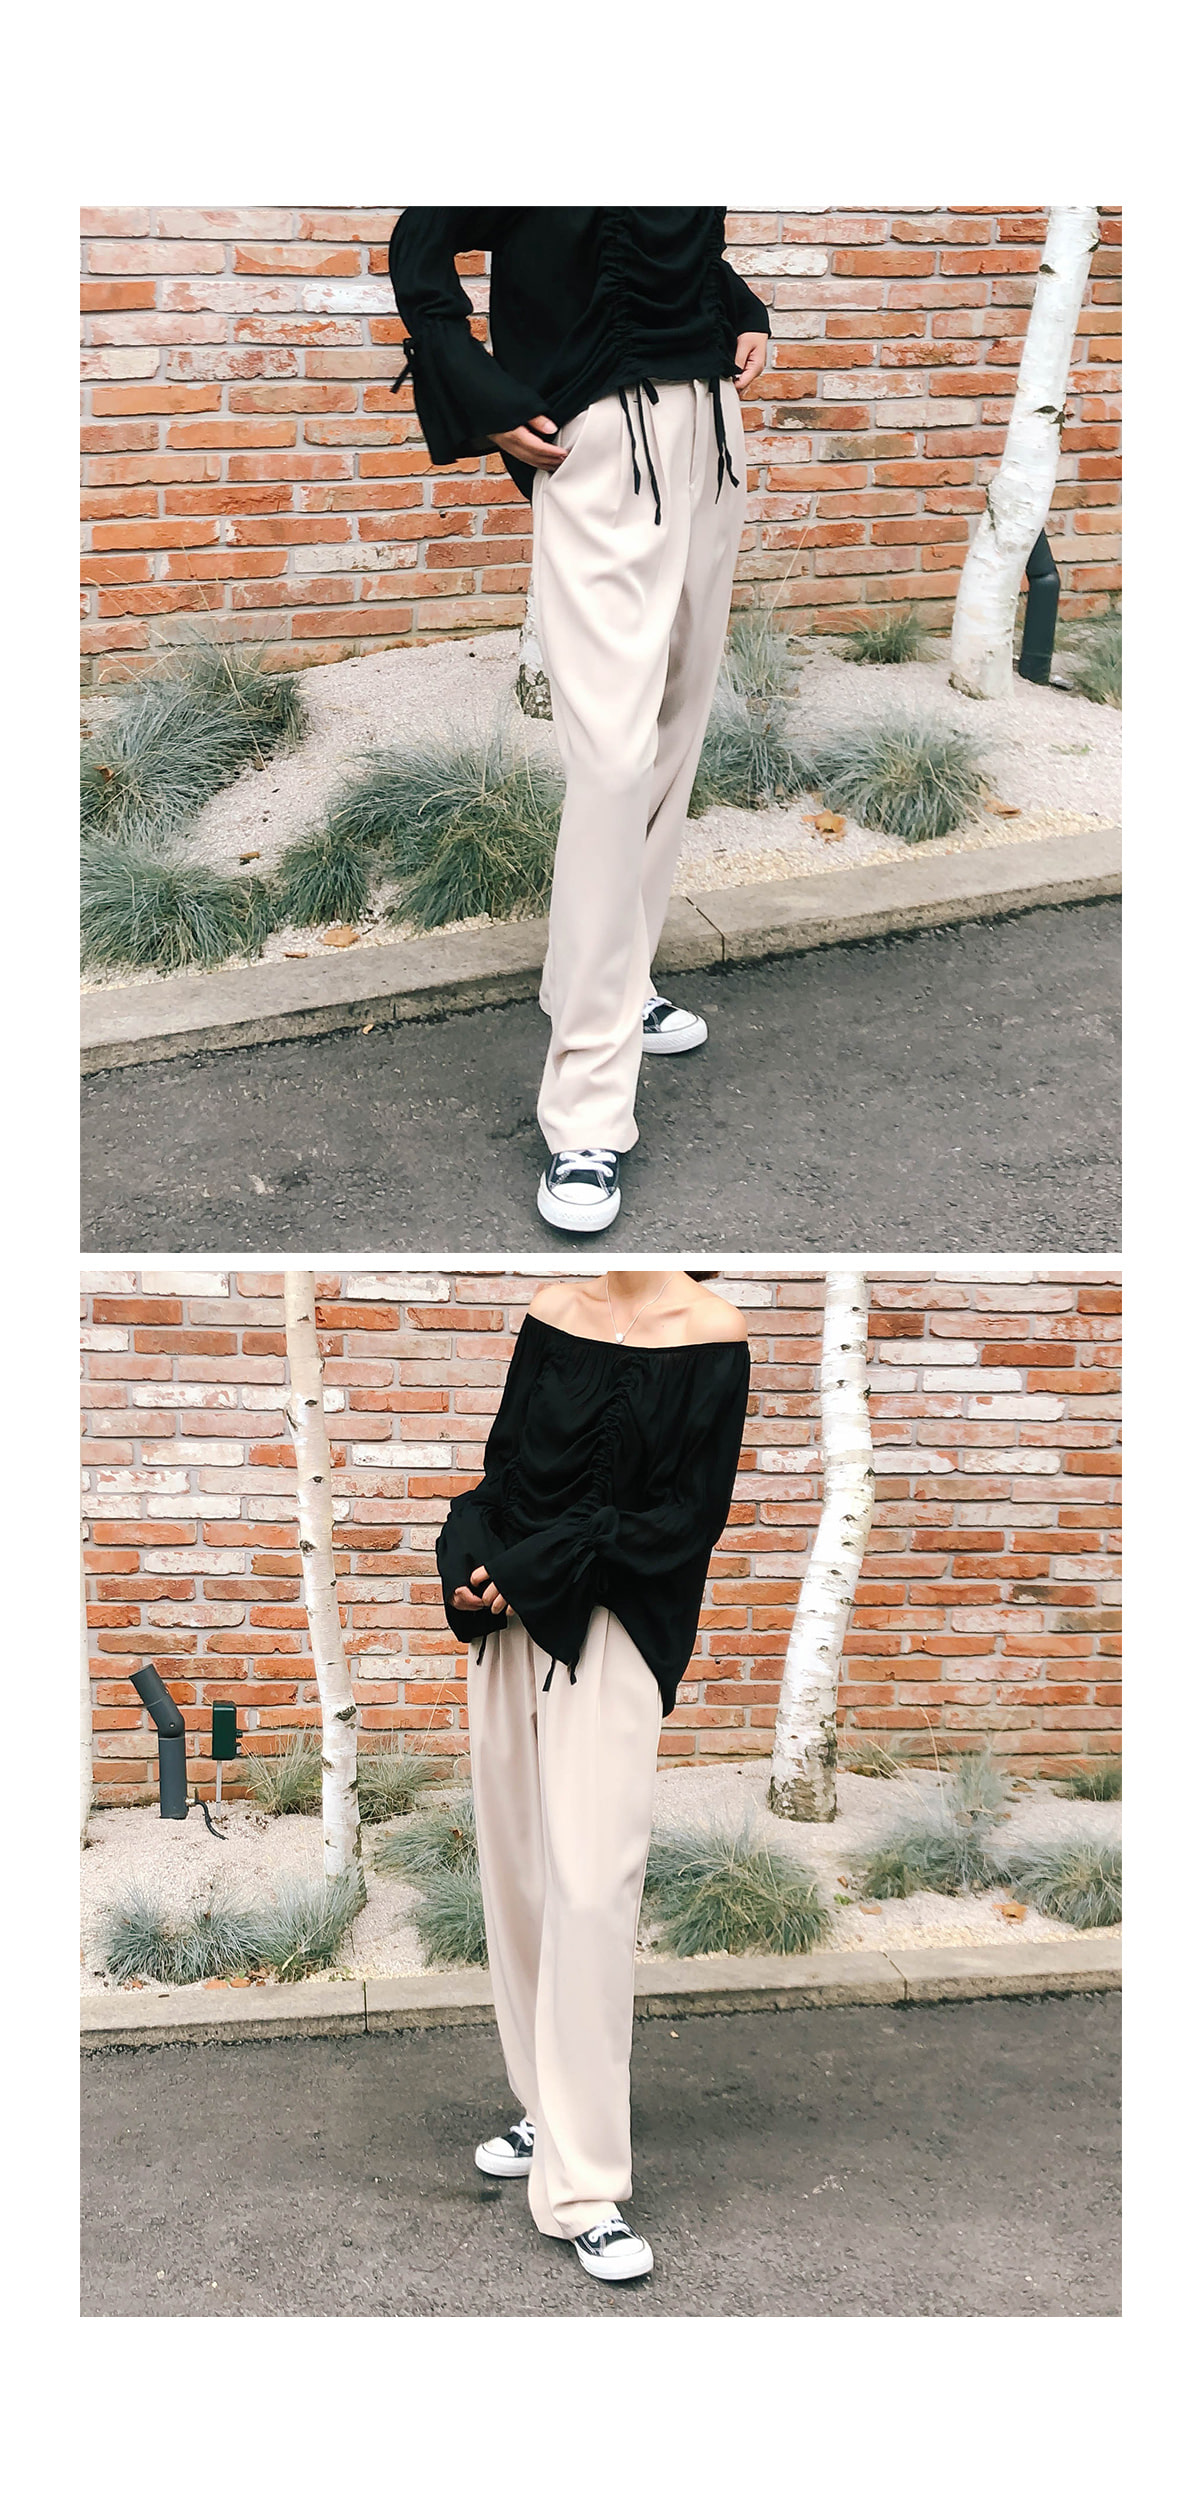 Pinch Wide Slacks Pants